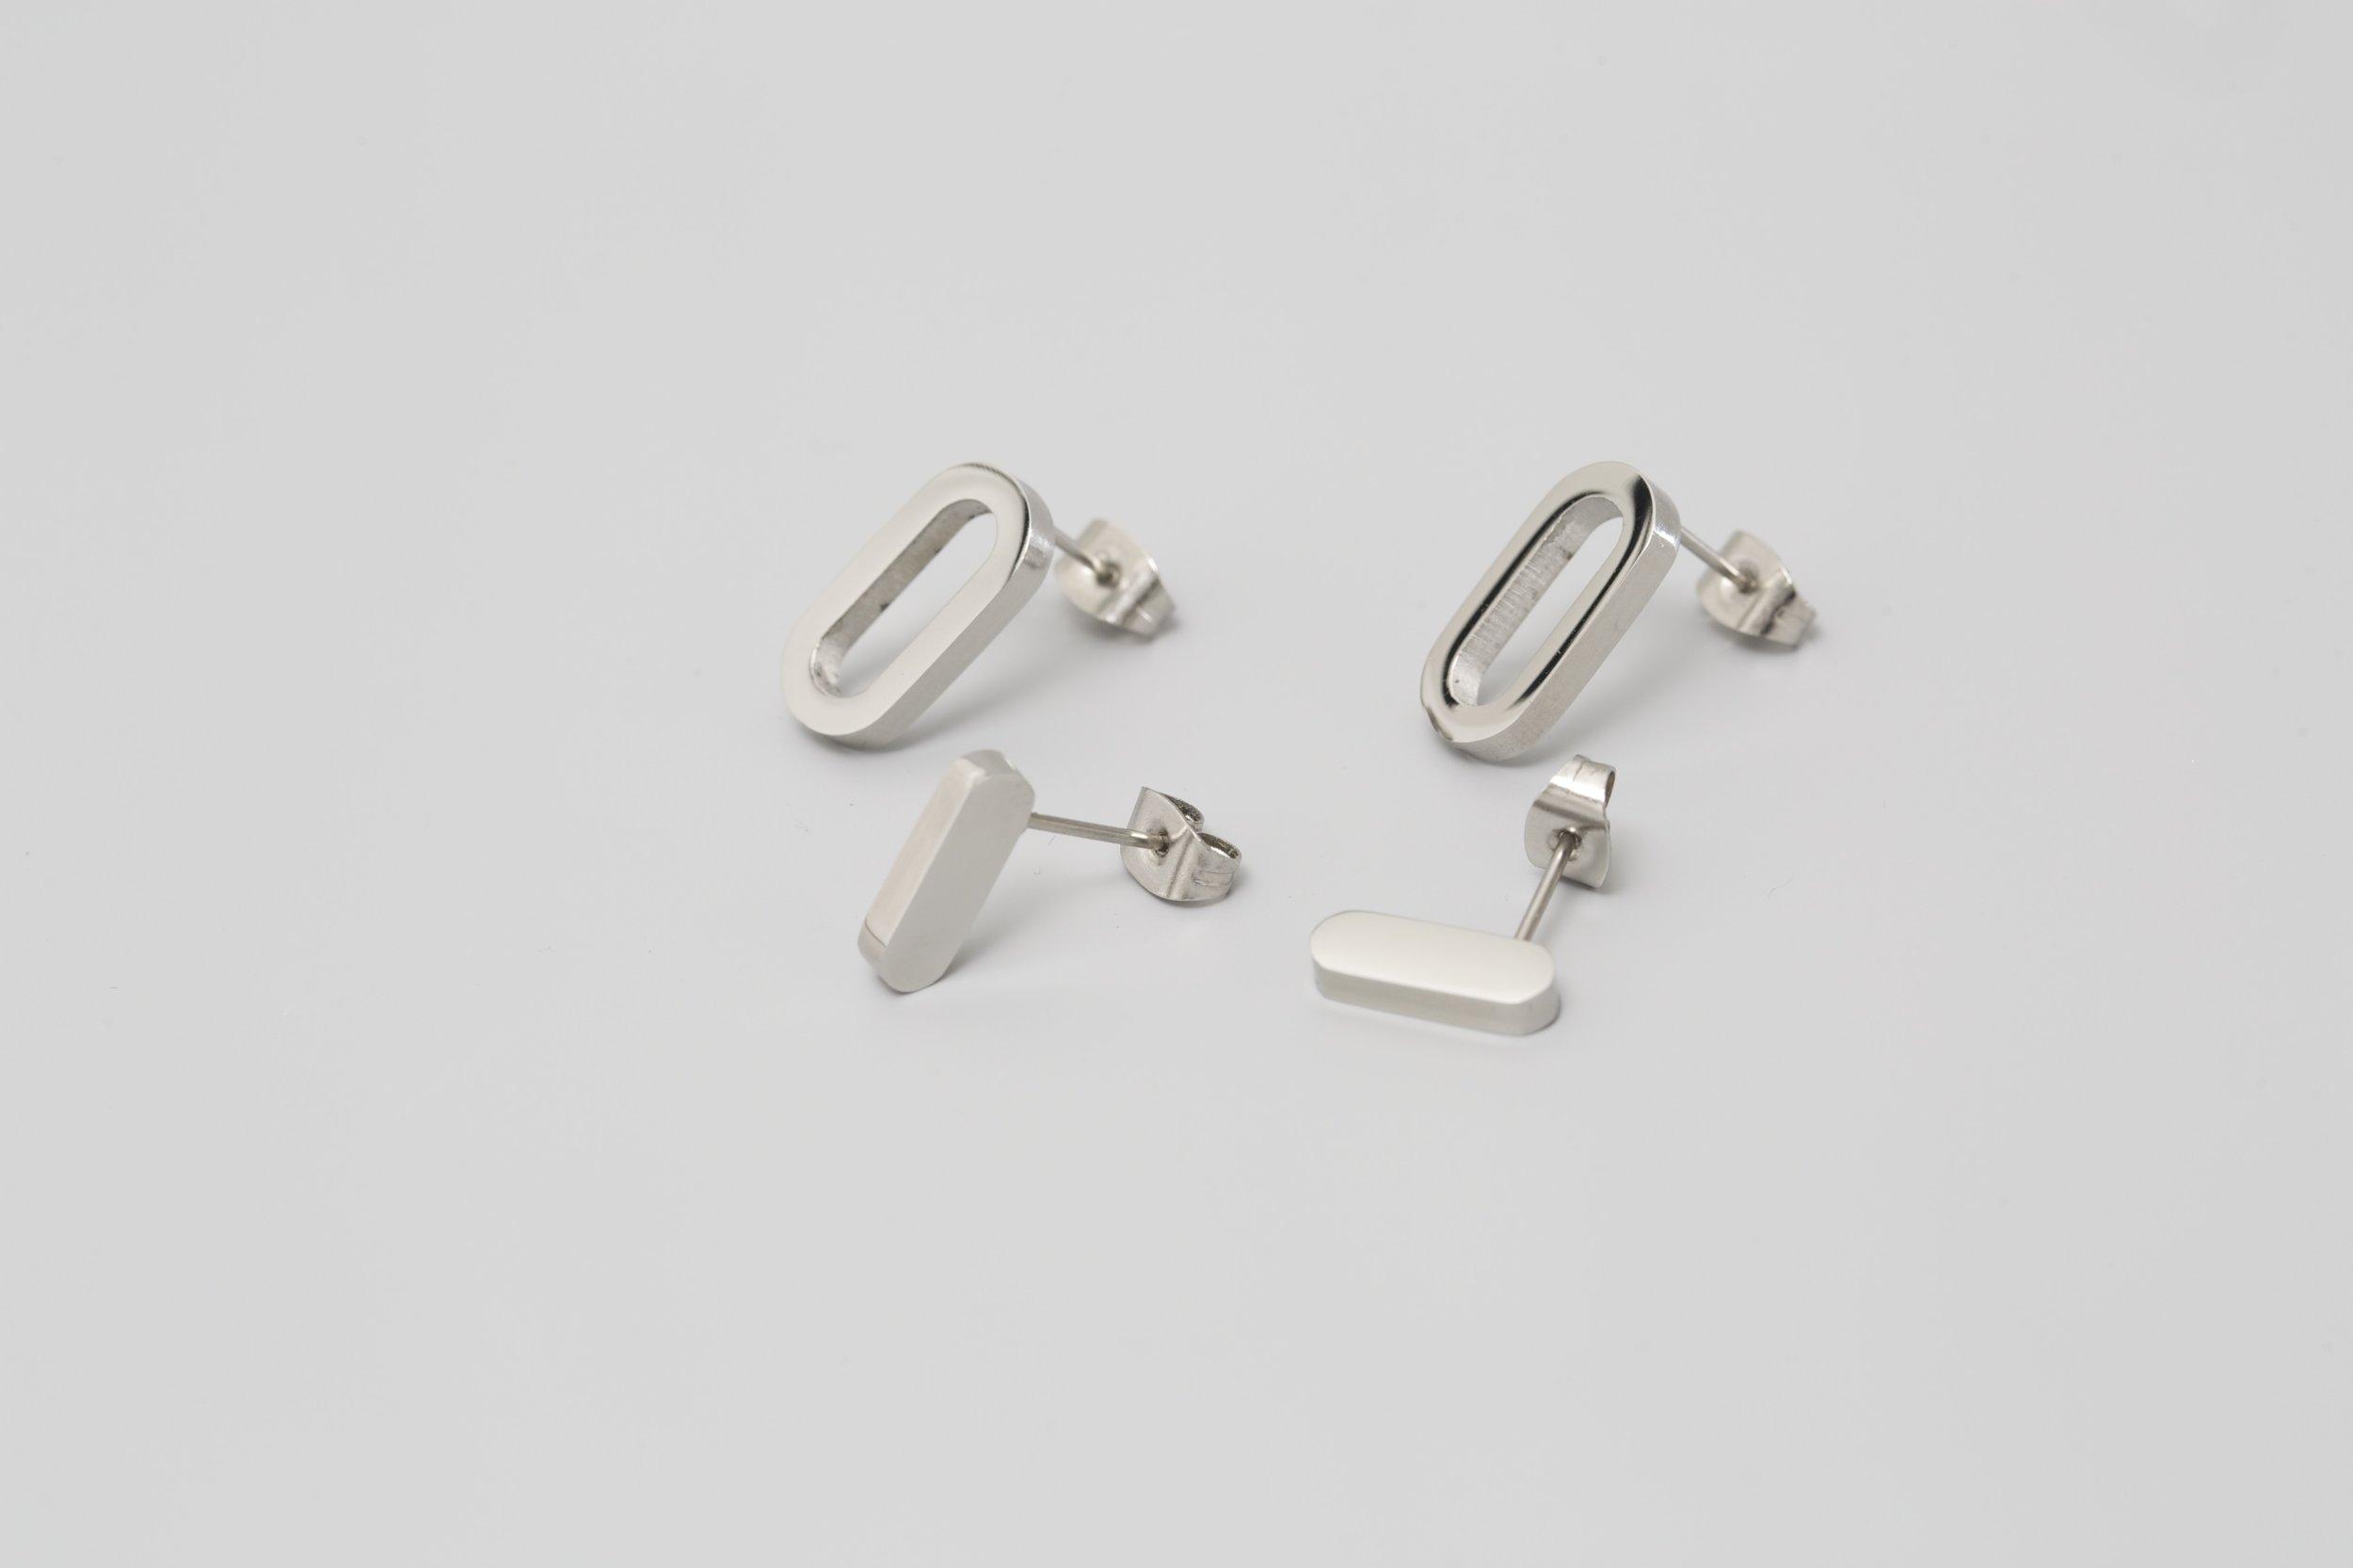 LOOPS duo - Acier inoxyadble miroir possibilité plaquage OR jaune ou rose.jpg